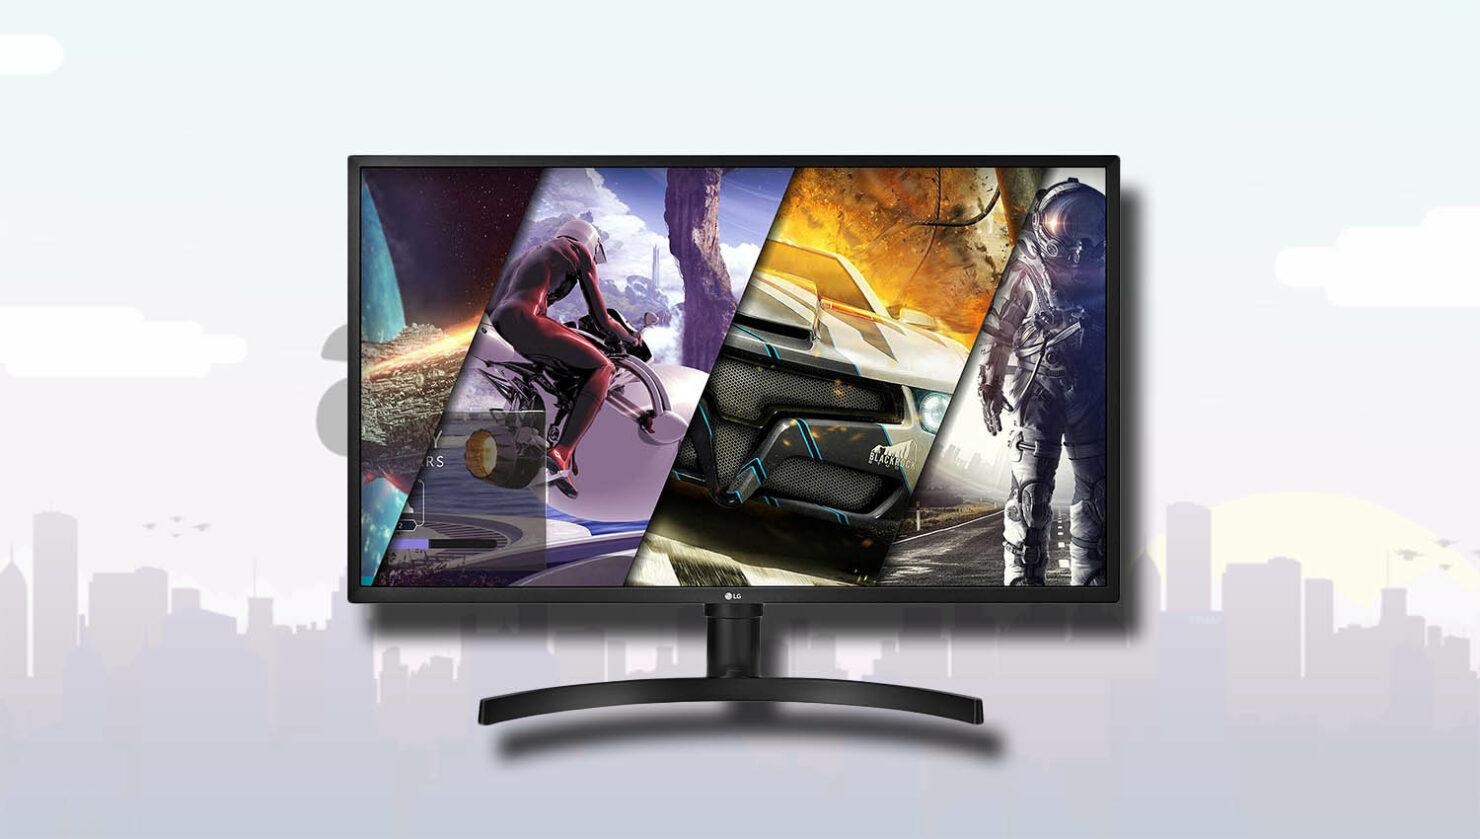 LG 32UK550-B 32 Inch 4K UHD Monitor with Radeon FreeSync Technology and HDR10